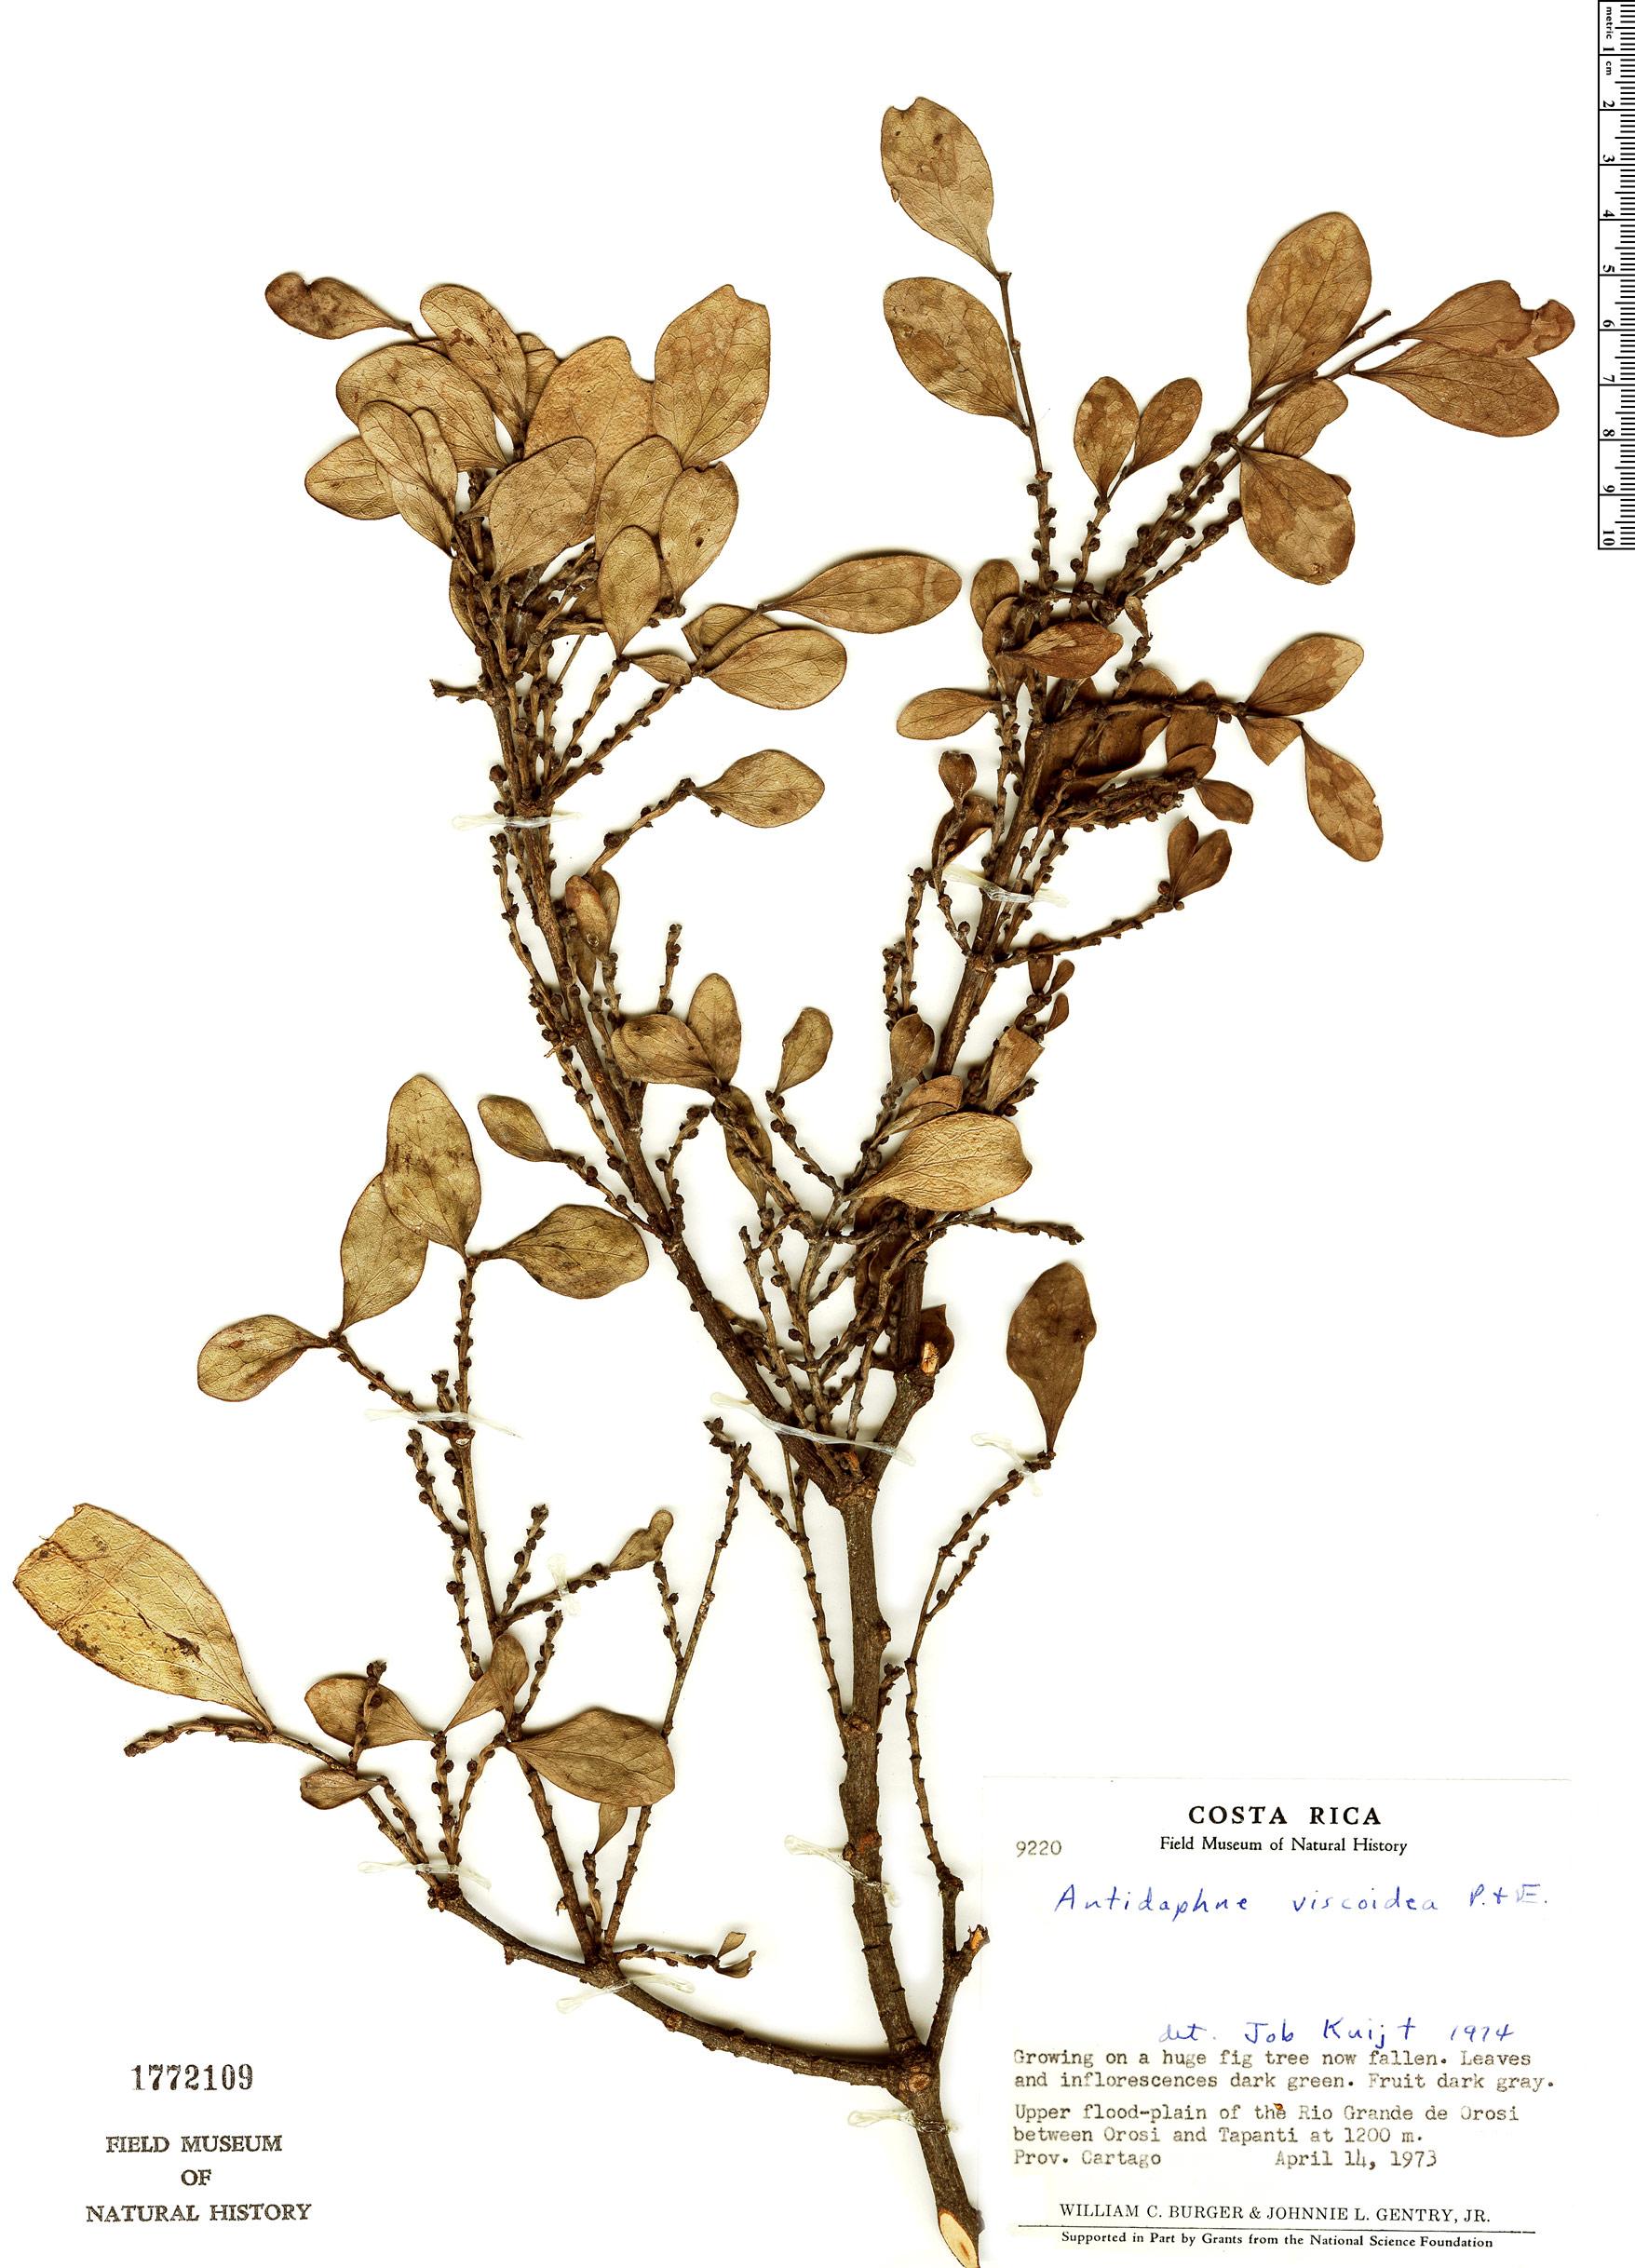 Specimen: Antidaphne viscoidea